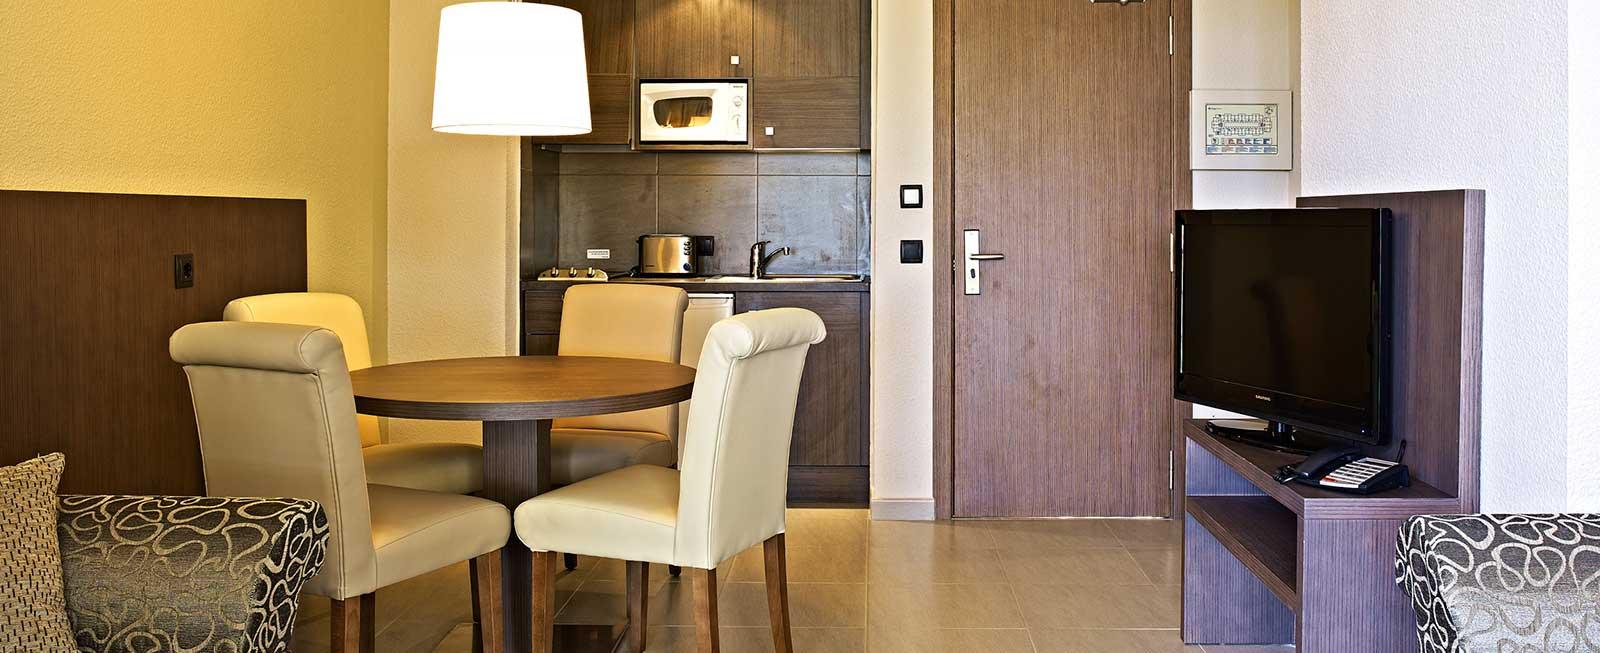 Rooms Protur Bonaire Aparthotel Cala Bona Majorca